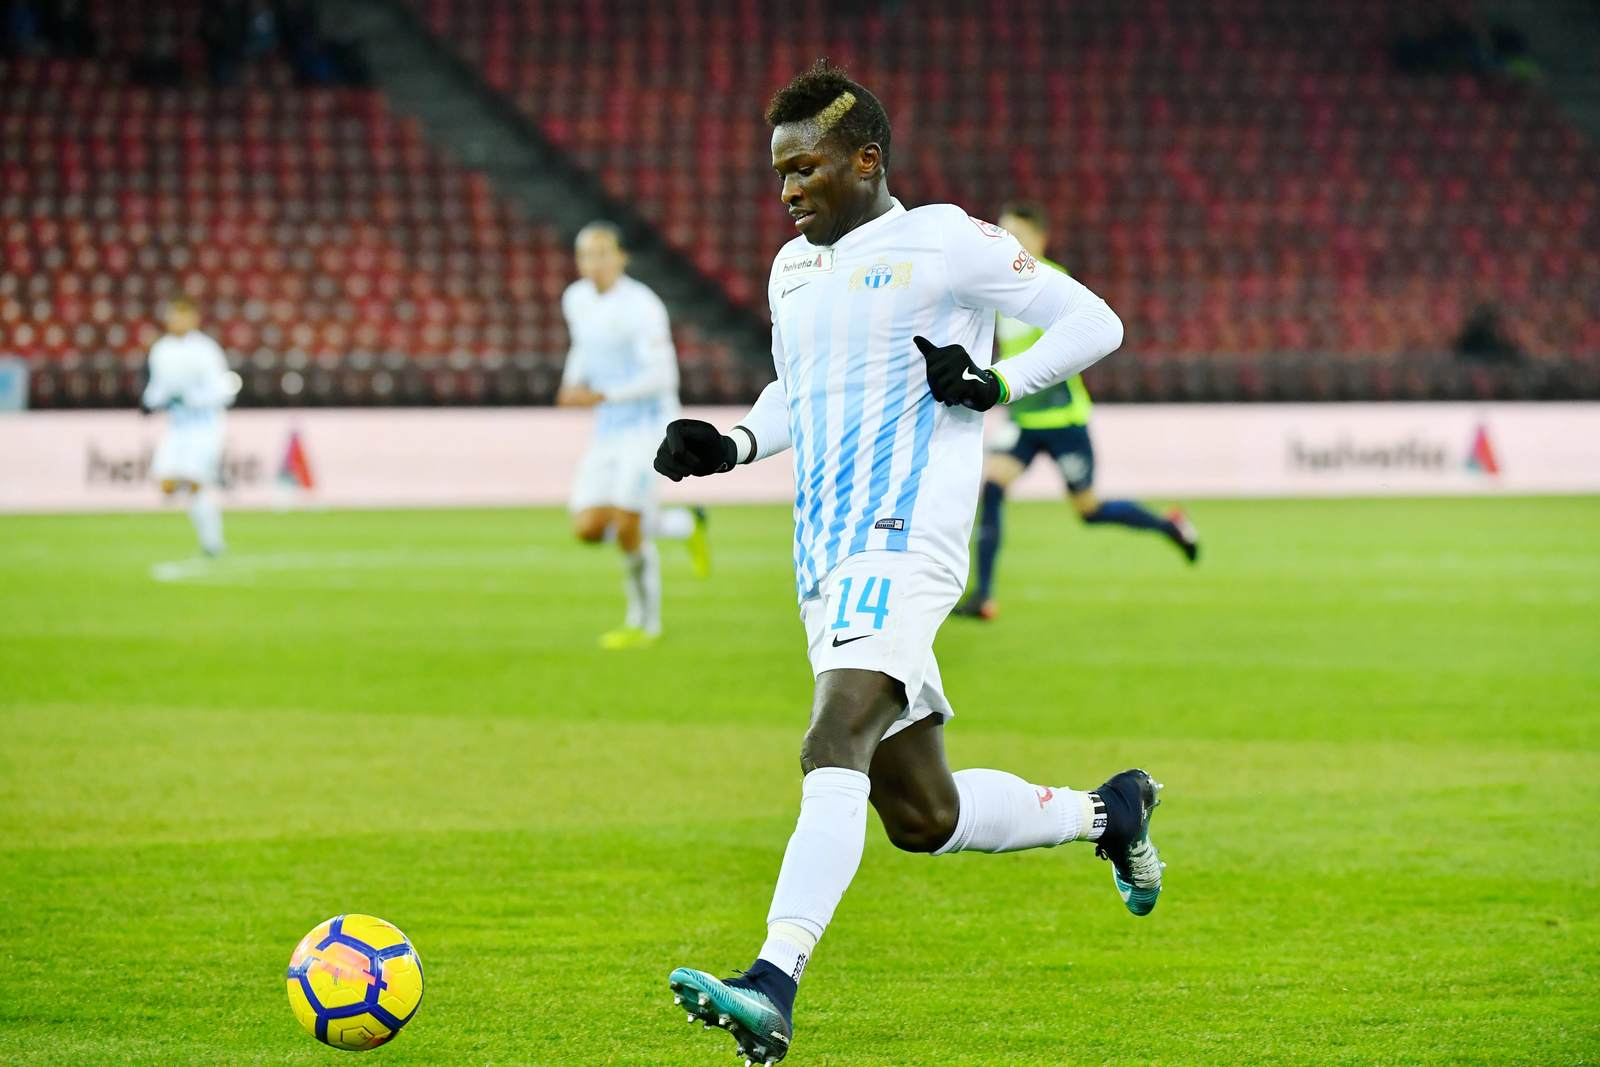 Moussa Koné vom FC Zürich am Ball.